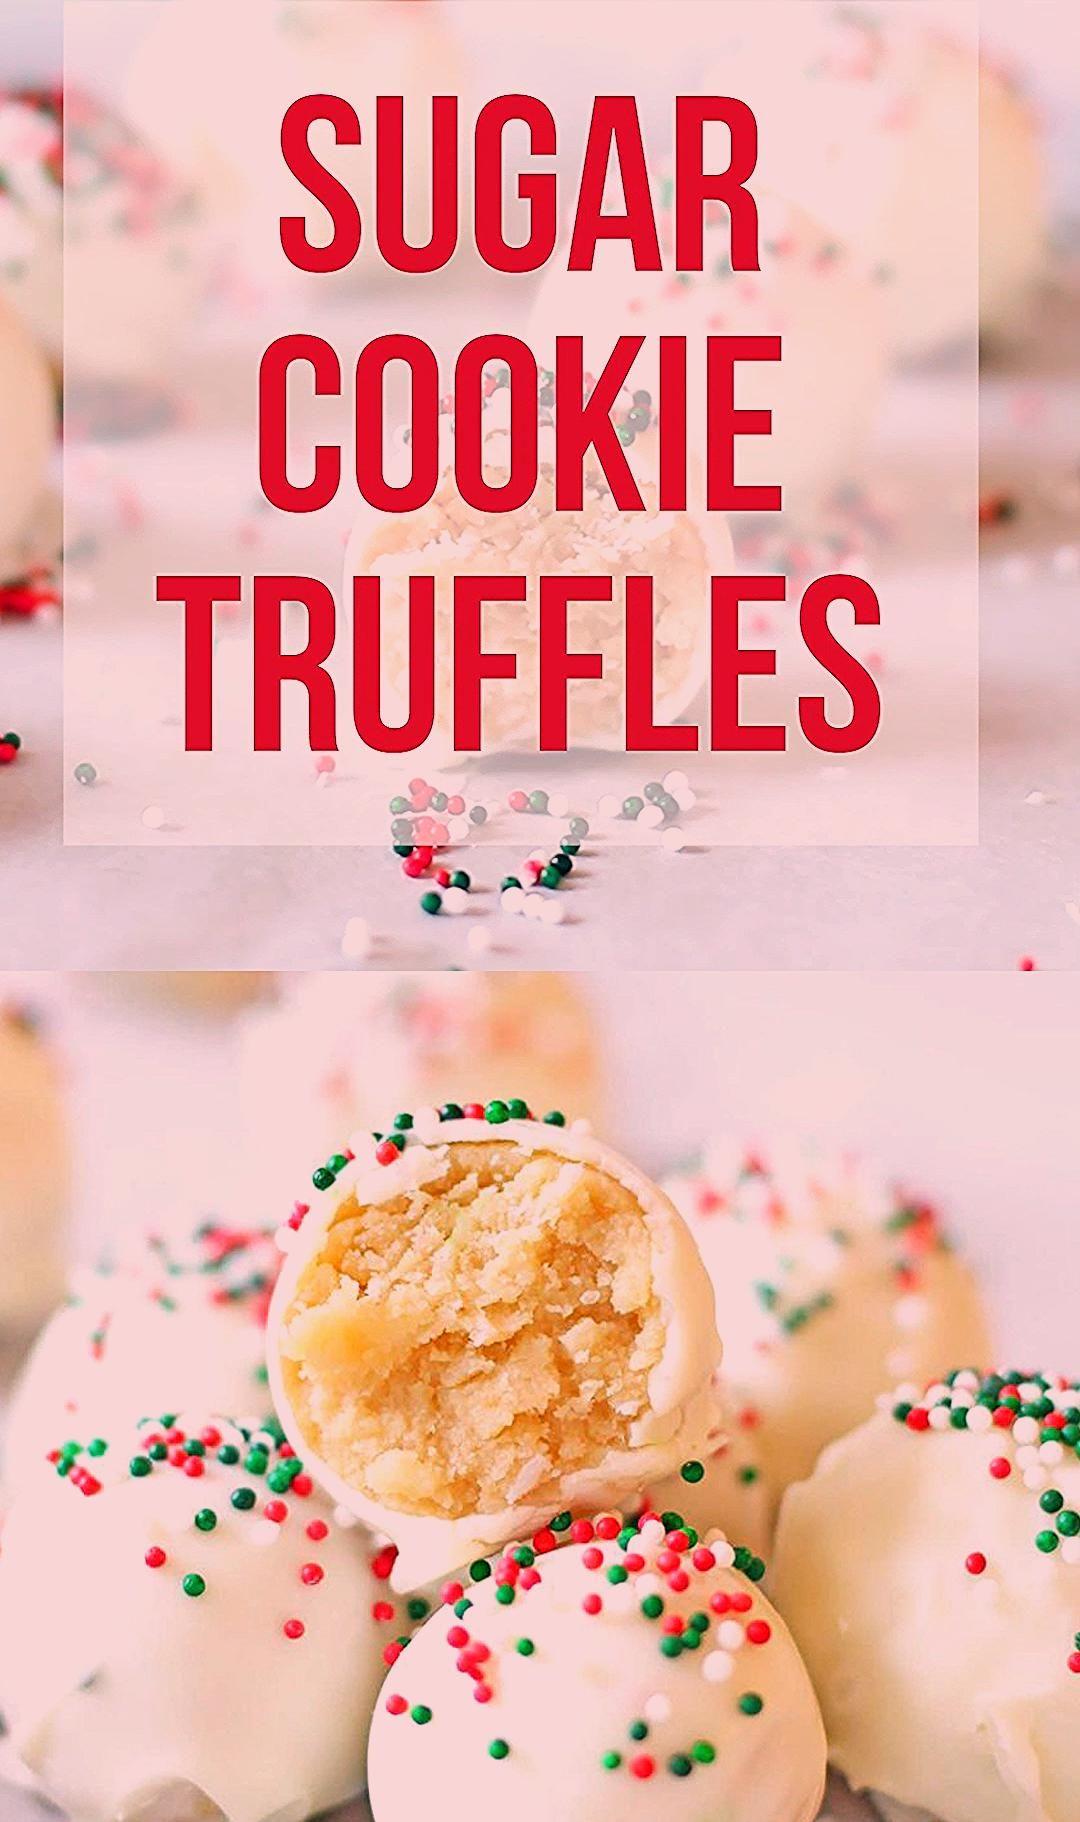 Photo of Sugar Cookie Truffles